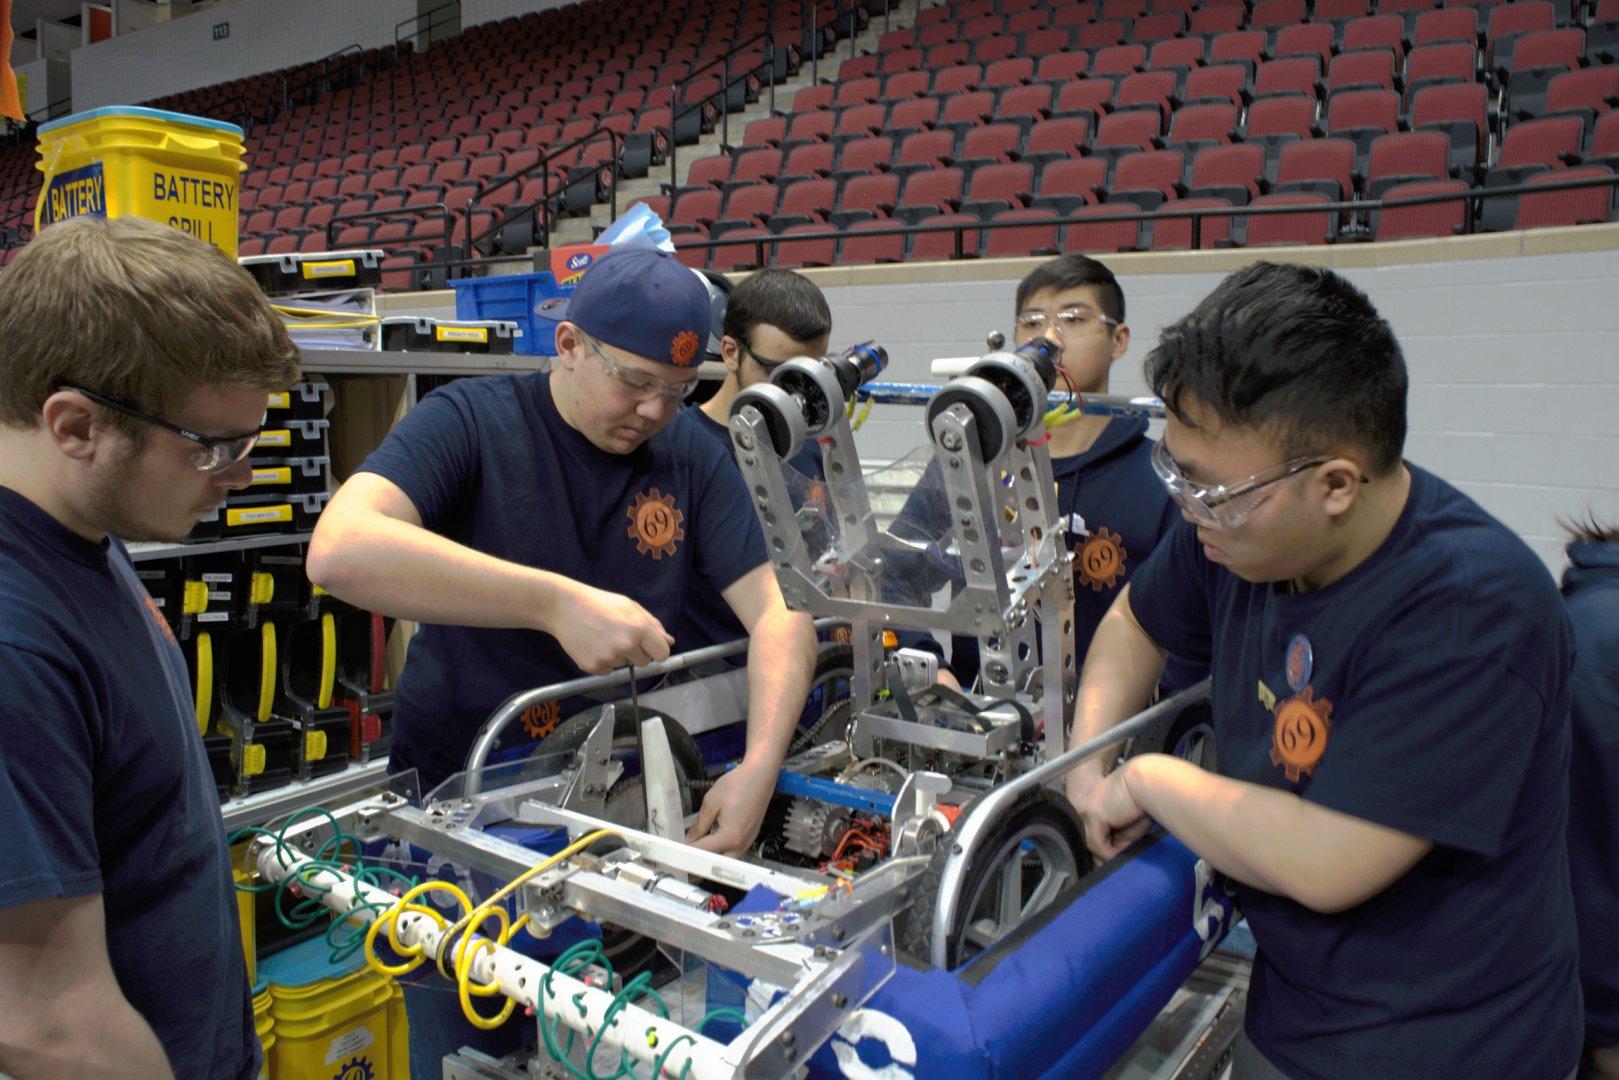 151.Boston FIRST Robotics Competition 04-03-2016.jpg